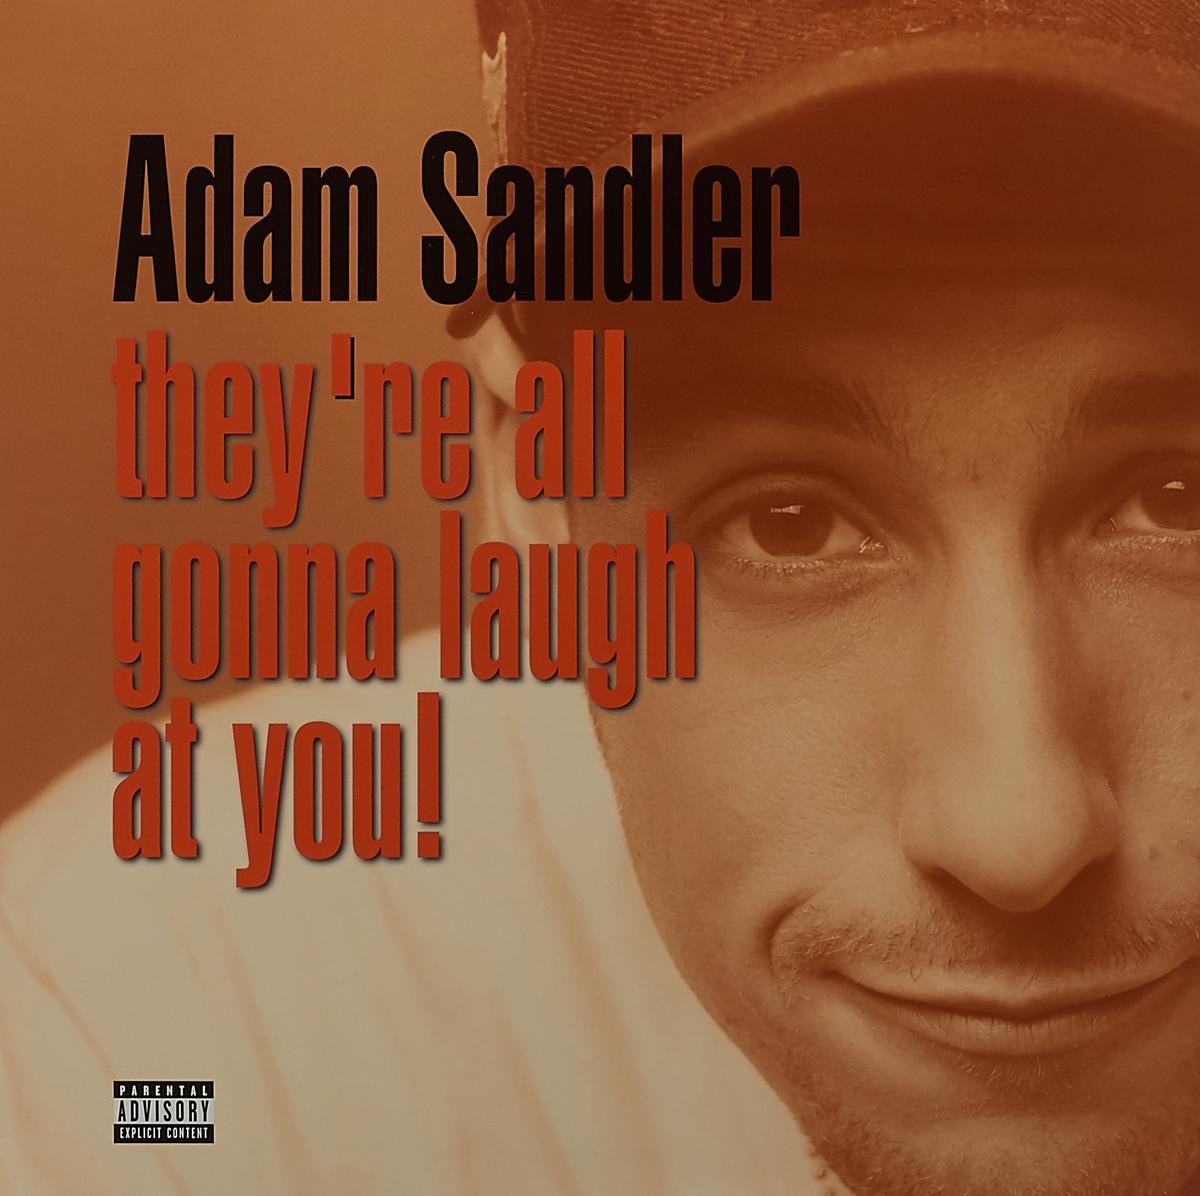 Адам Сэндлер Adam Sandler. They're All Gonna Laugh At You! (2 LP)